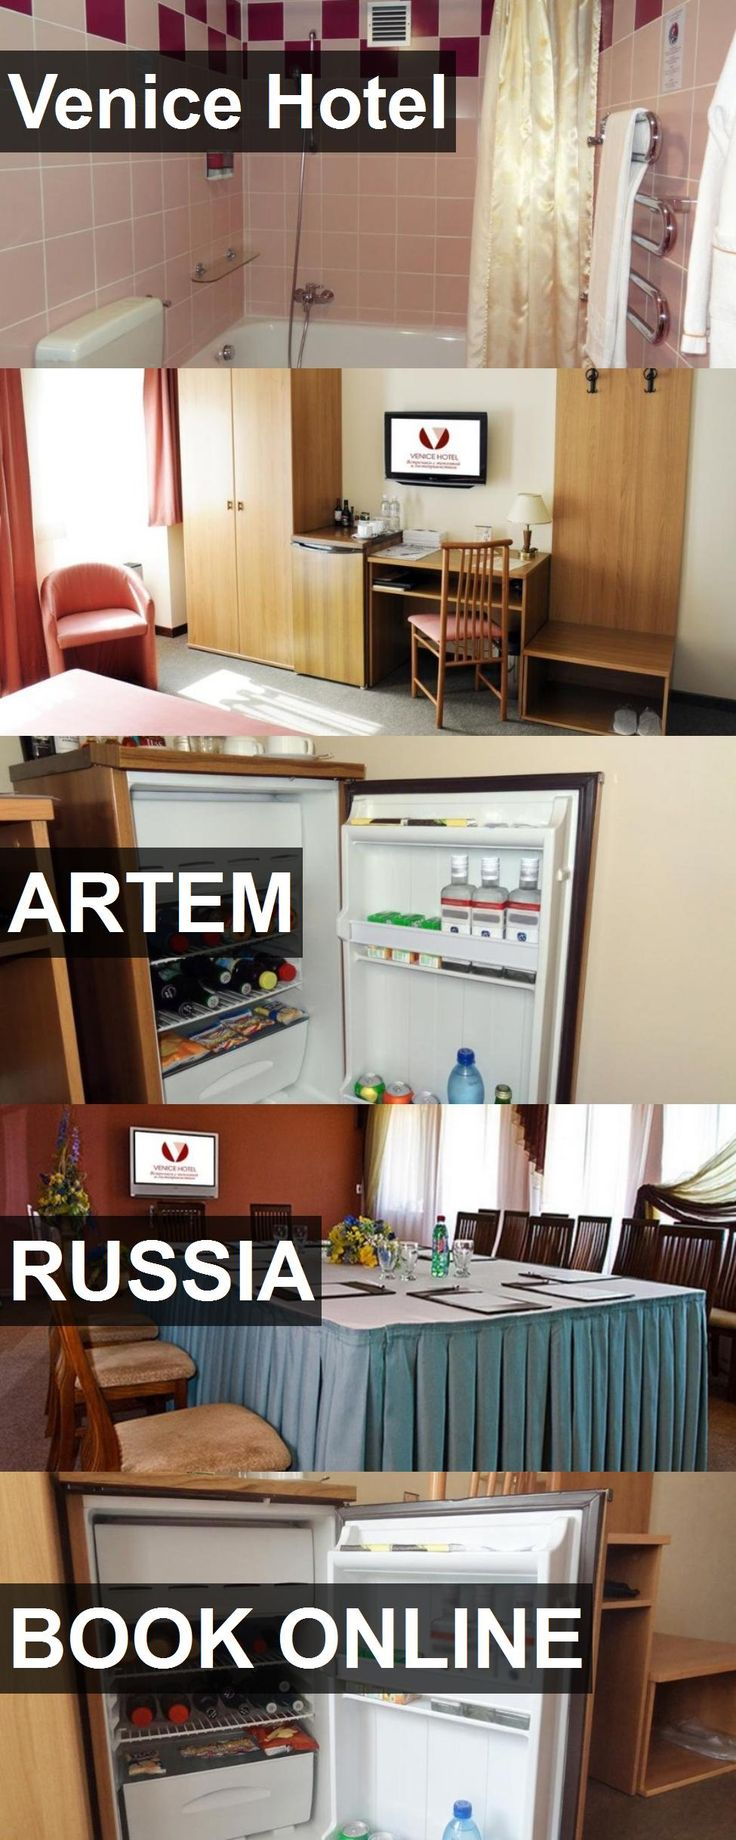 Die besten 25+ Beste hotels in venedig Ideen auf Pinterest ...